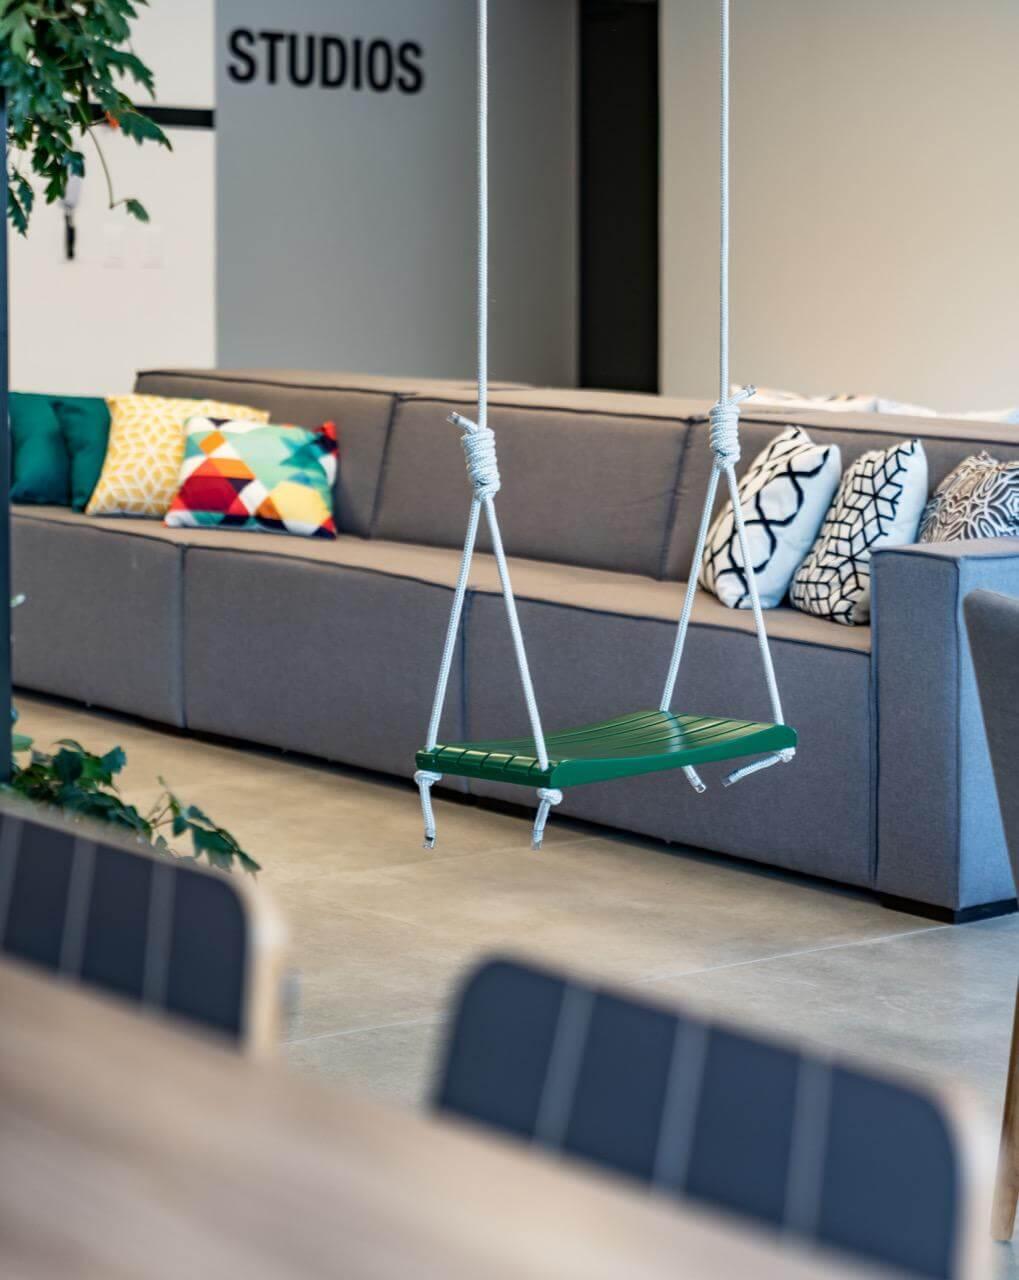 - Empreendimento: Cine Presidente - móveis das áreas comuns - Projeto: Maena Design Conecta -@maenaconecta (fotos: Roberta Gewehr)